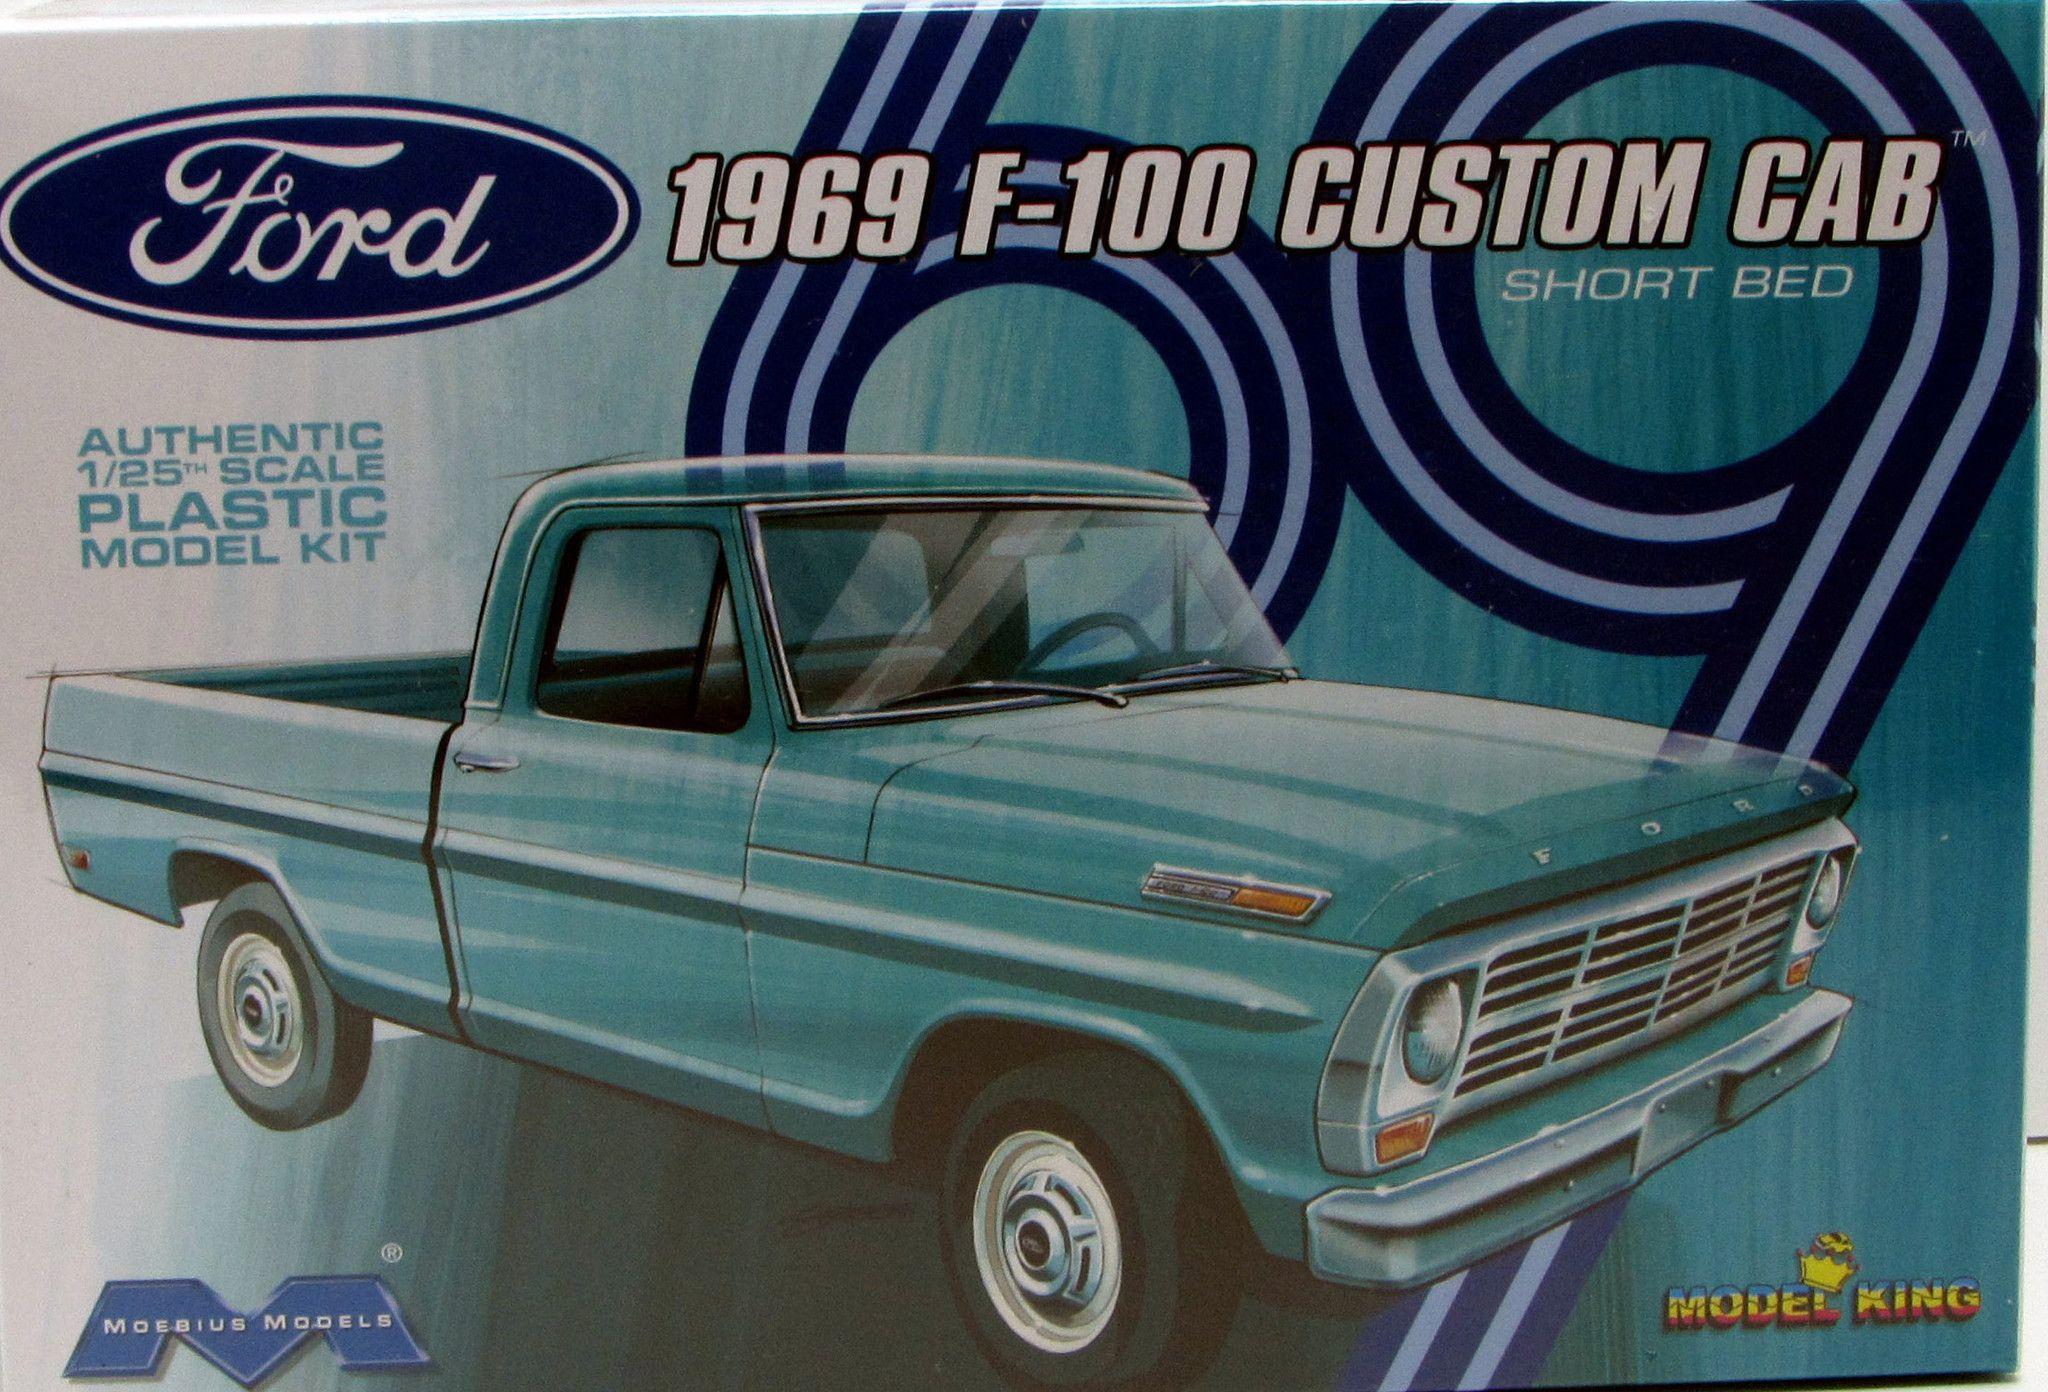 1969 Ford F 100 Pickup Moebius Models 1 25 New Truck Model Kit Model Truck Kits Plastic Model Kits Cars Model Cars Kits